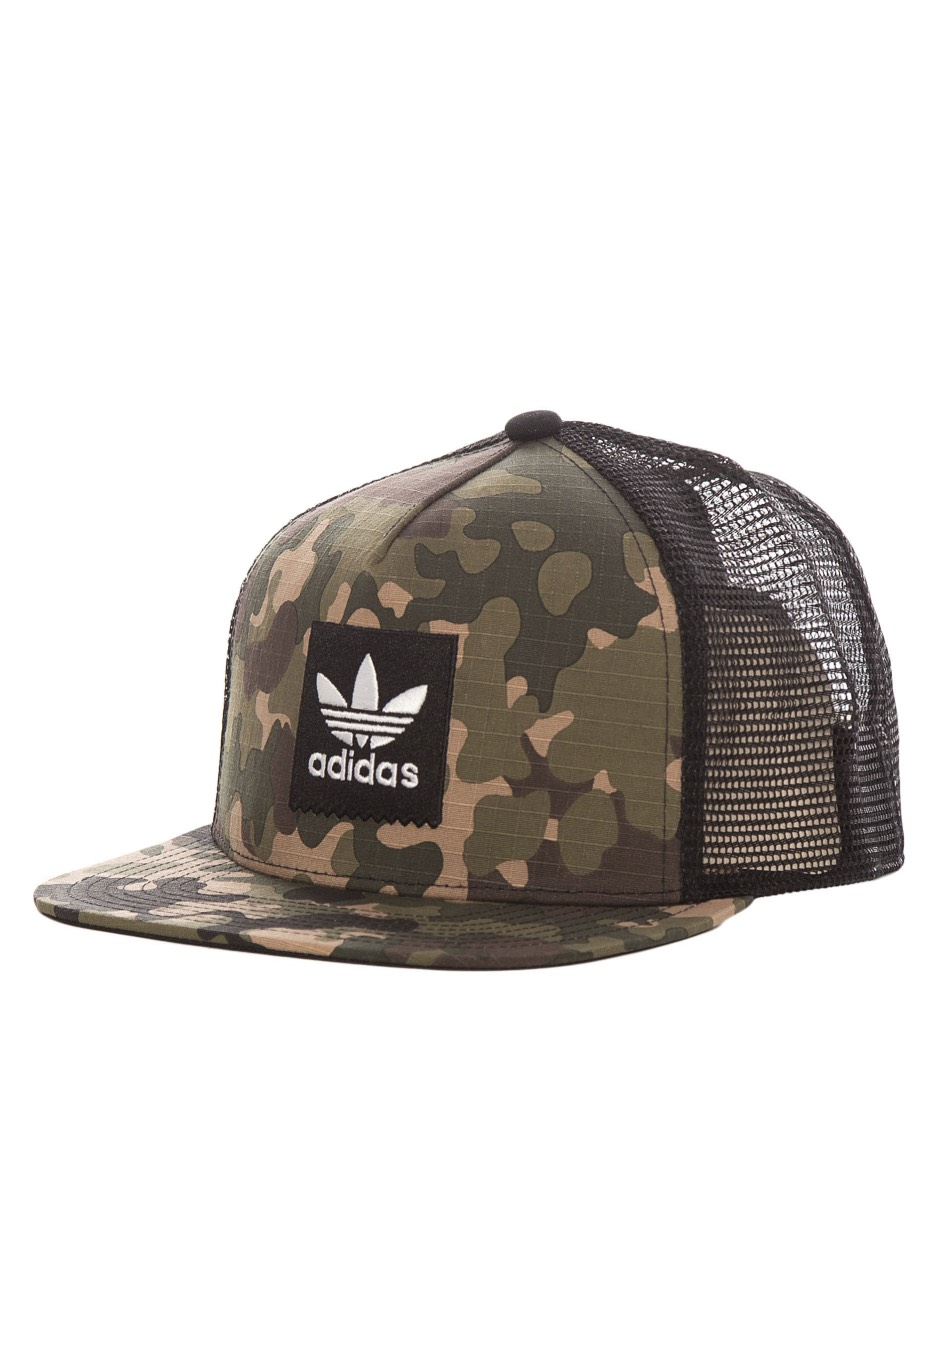 Adidas - Camo Trucker Multicolor - Cap - Streetwear Shop - Impericon.com UK 6d62f537cad